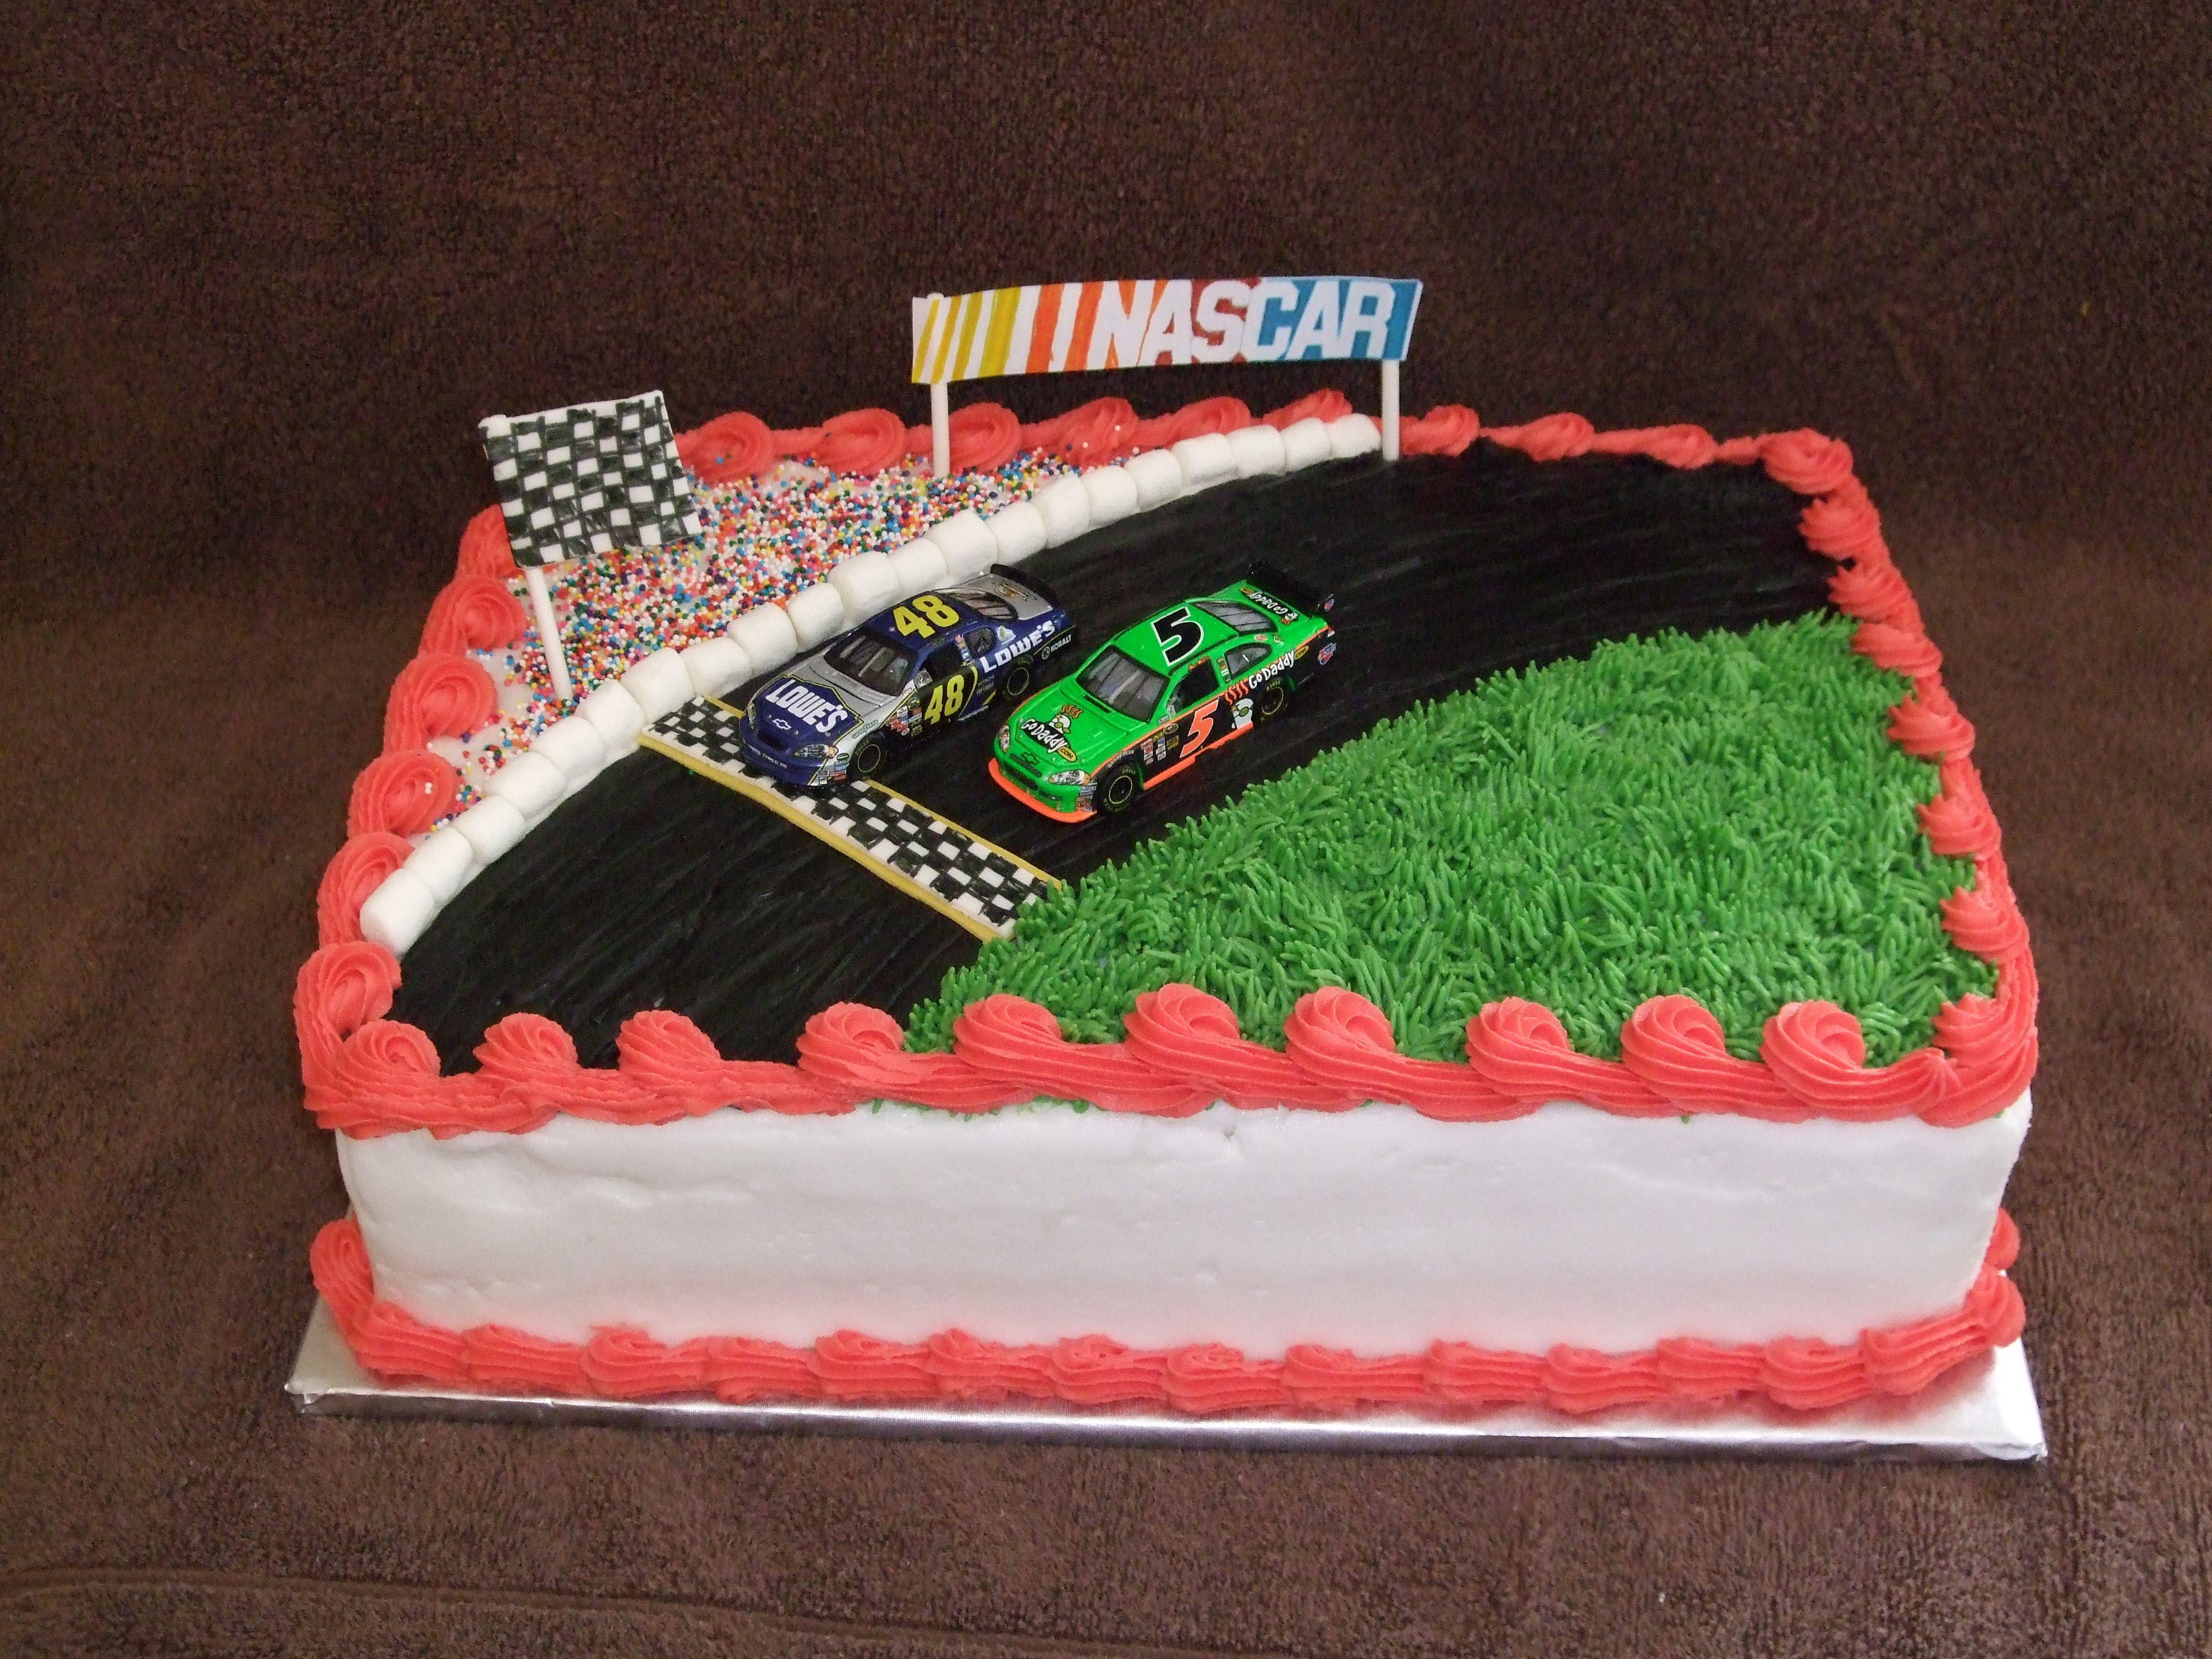 NASCARbirthdaycakeforaNASCARfan Cake decorating